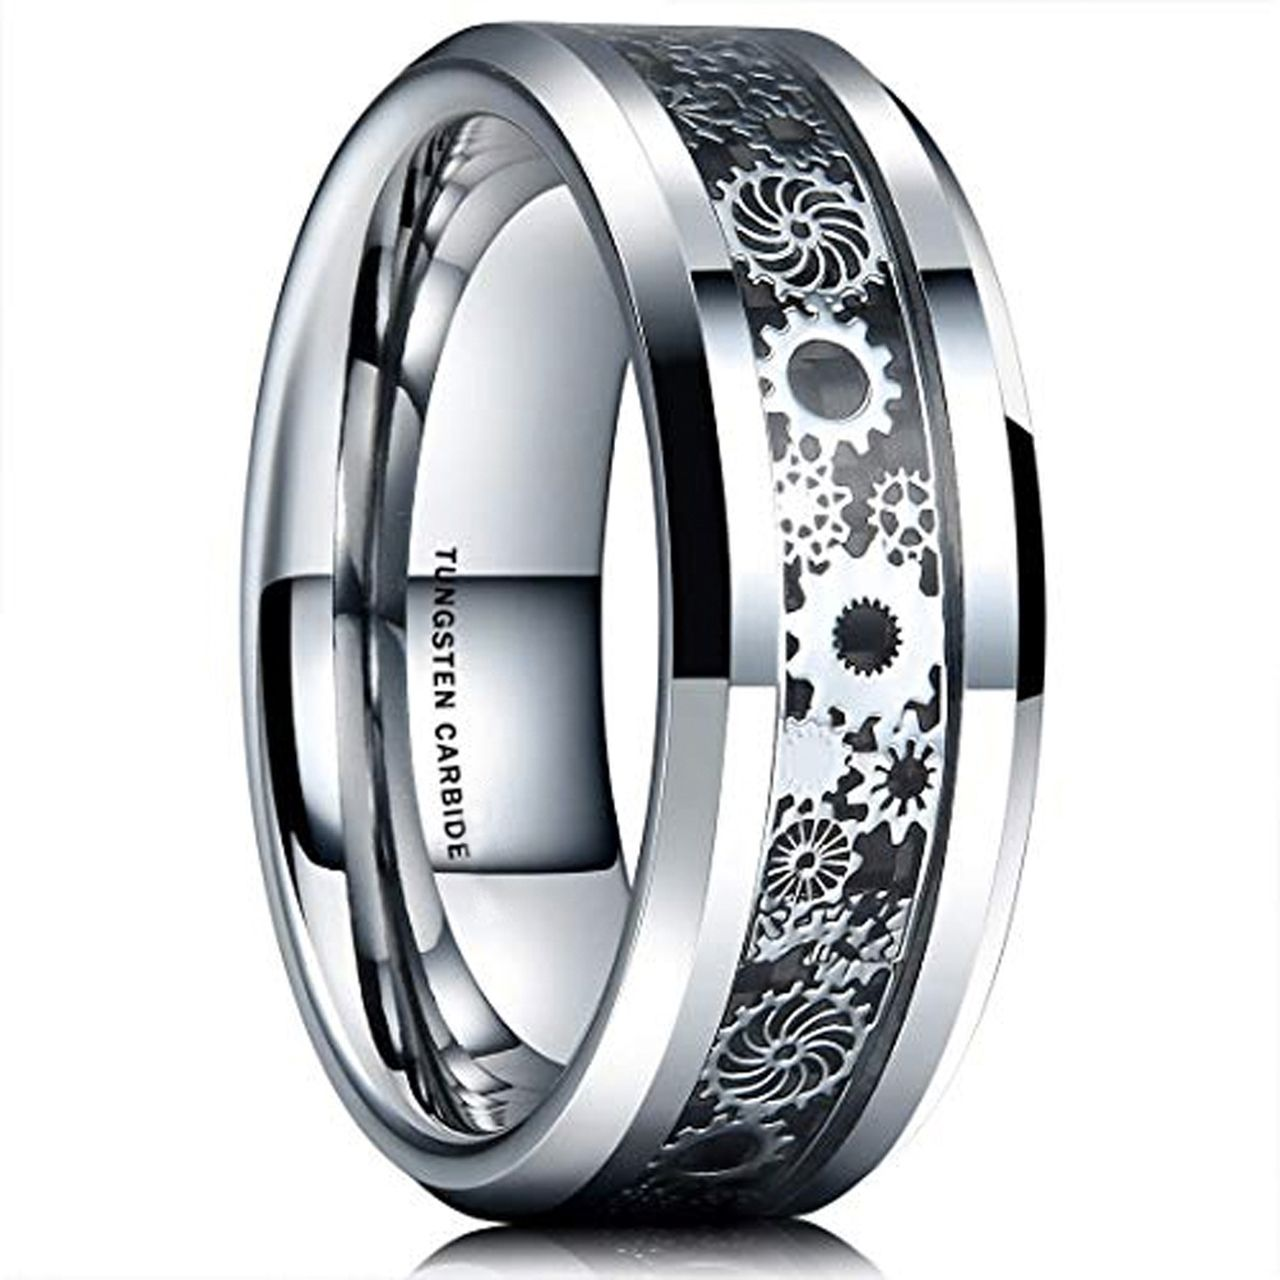 (8mm) Unisex or Men's Tungsten Carbide Wedding Ring Band